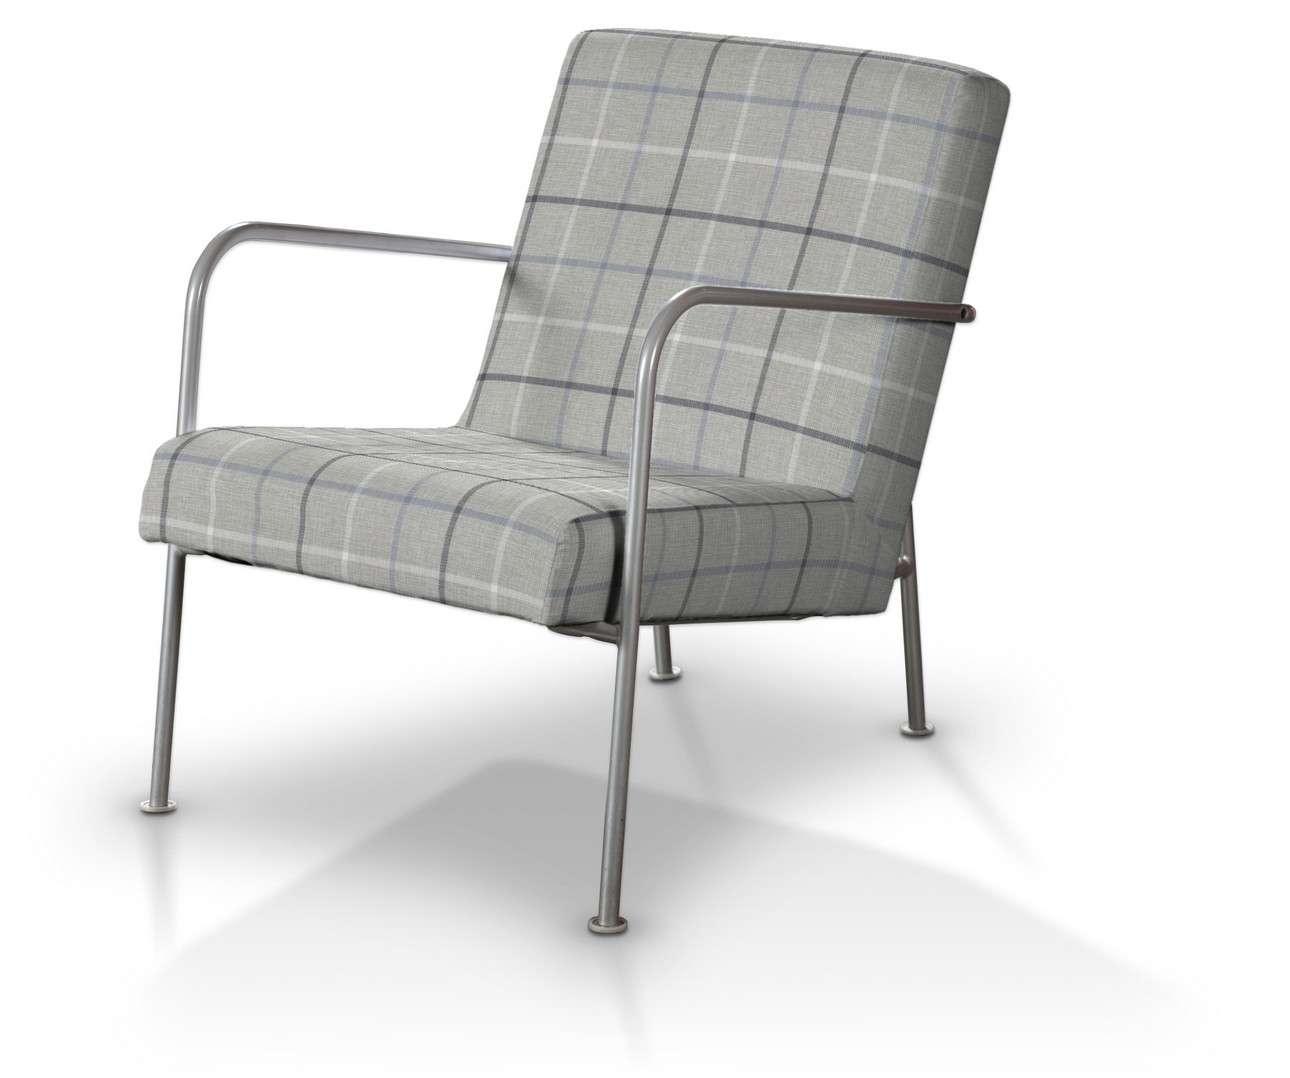 Potah na křeslo Ikea PS v kolekci Edinburgh, látka: 703-18